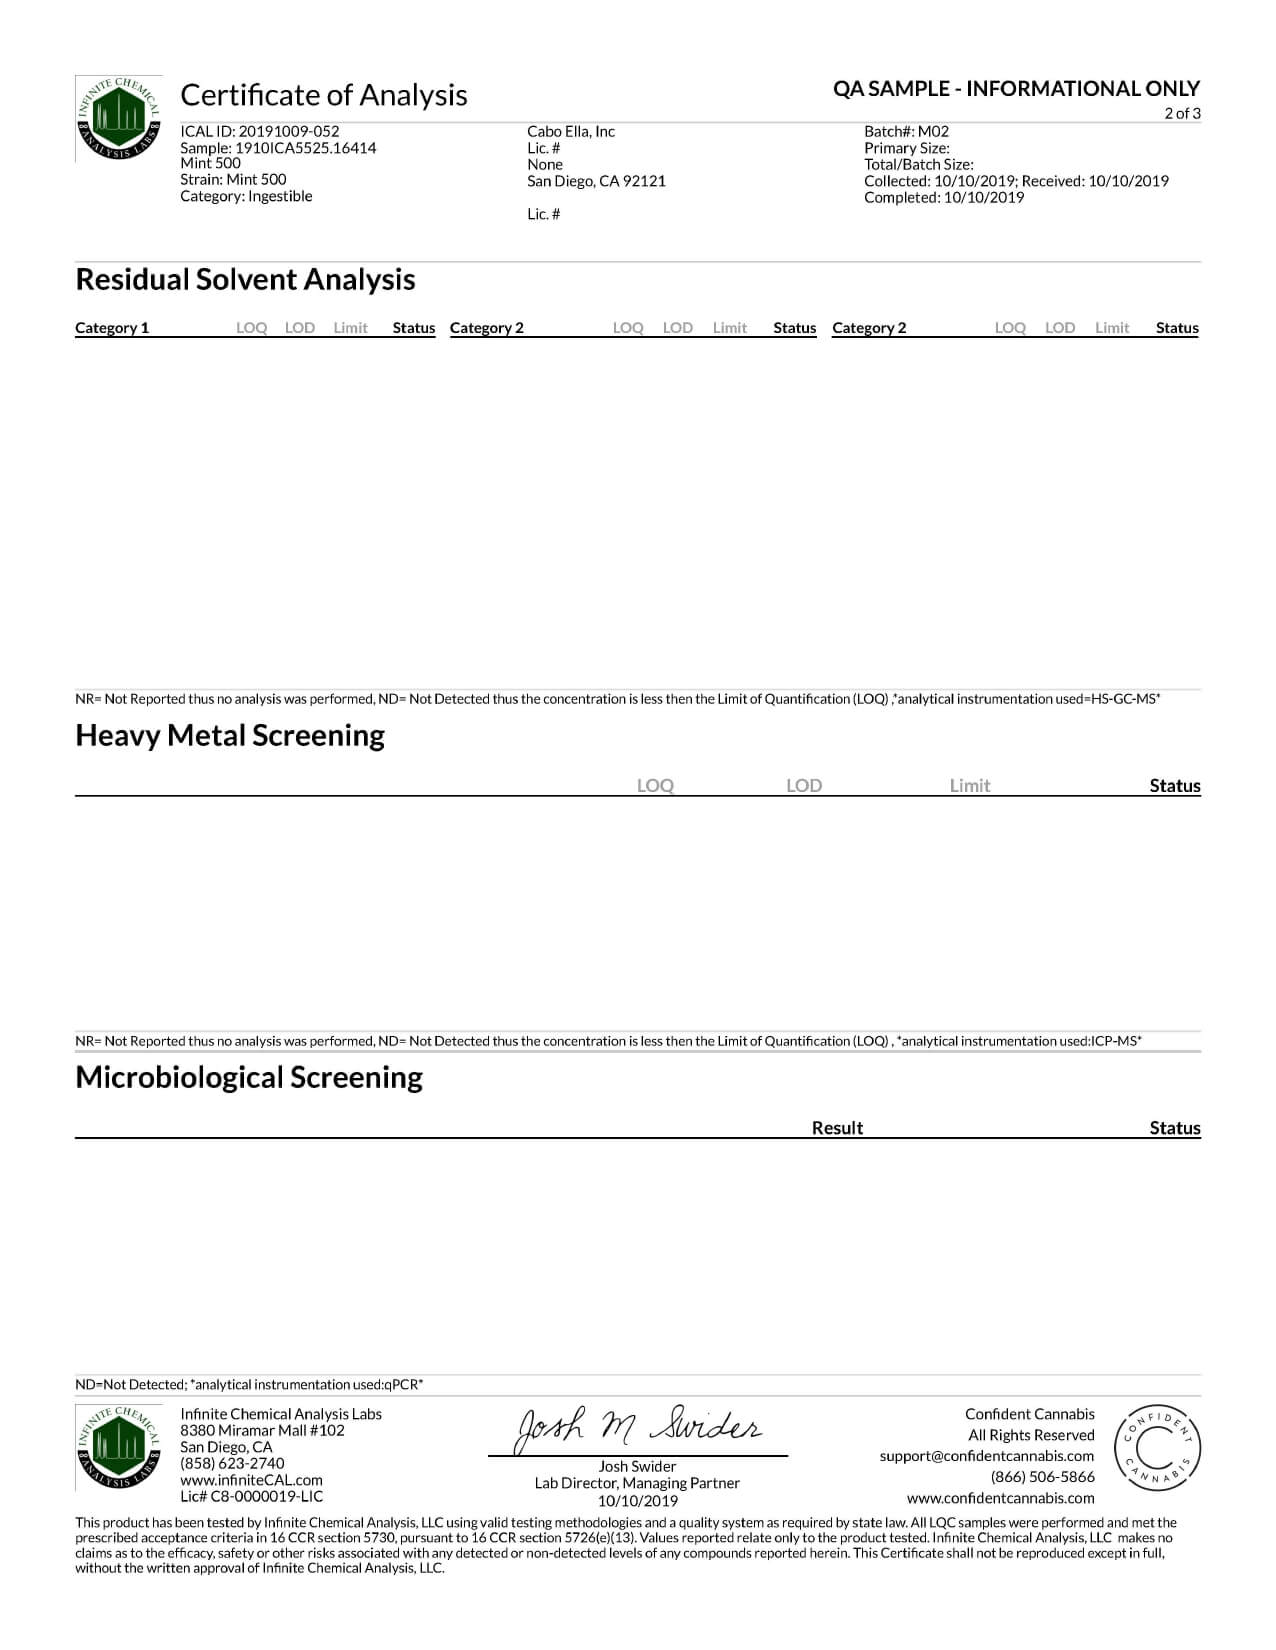 Smilyn CBD Tincture Mint 500mg Lab Report